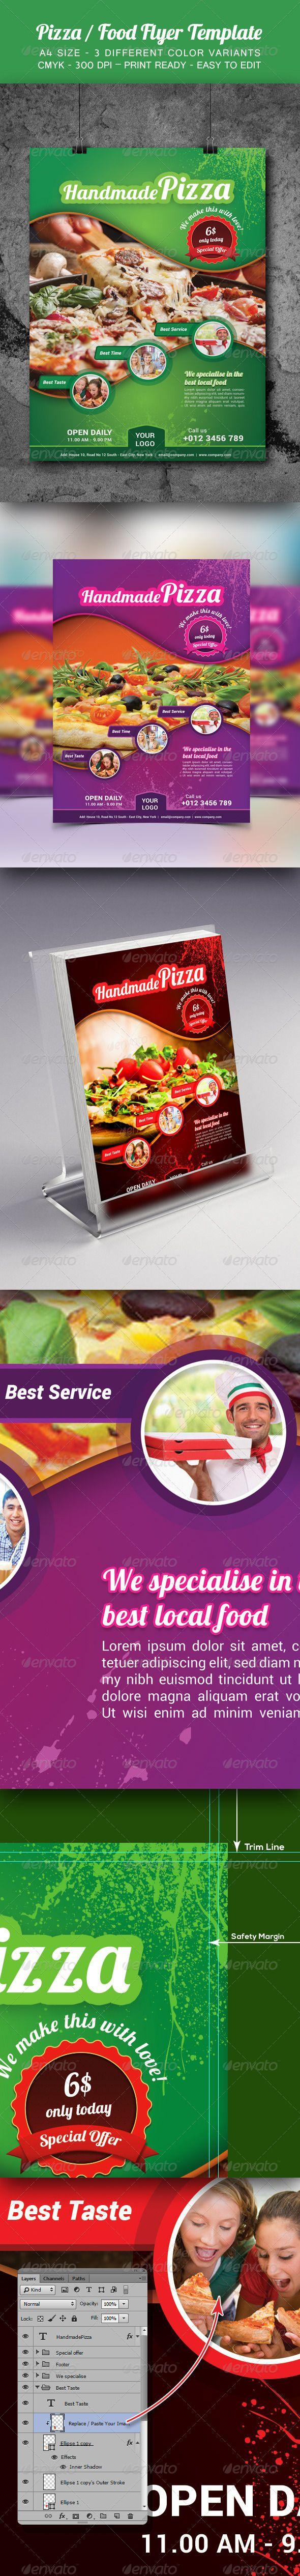 Pizza / Food Flyer Template #design Download: http://graphicriver.net/item/pizza-food-flyer-template/8646219?ref=ksioks